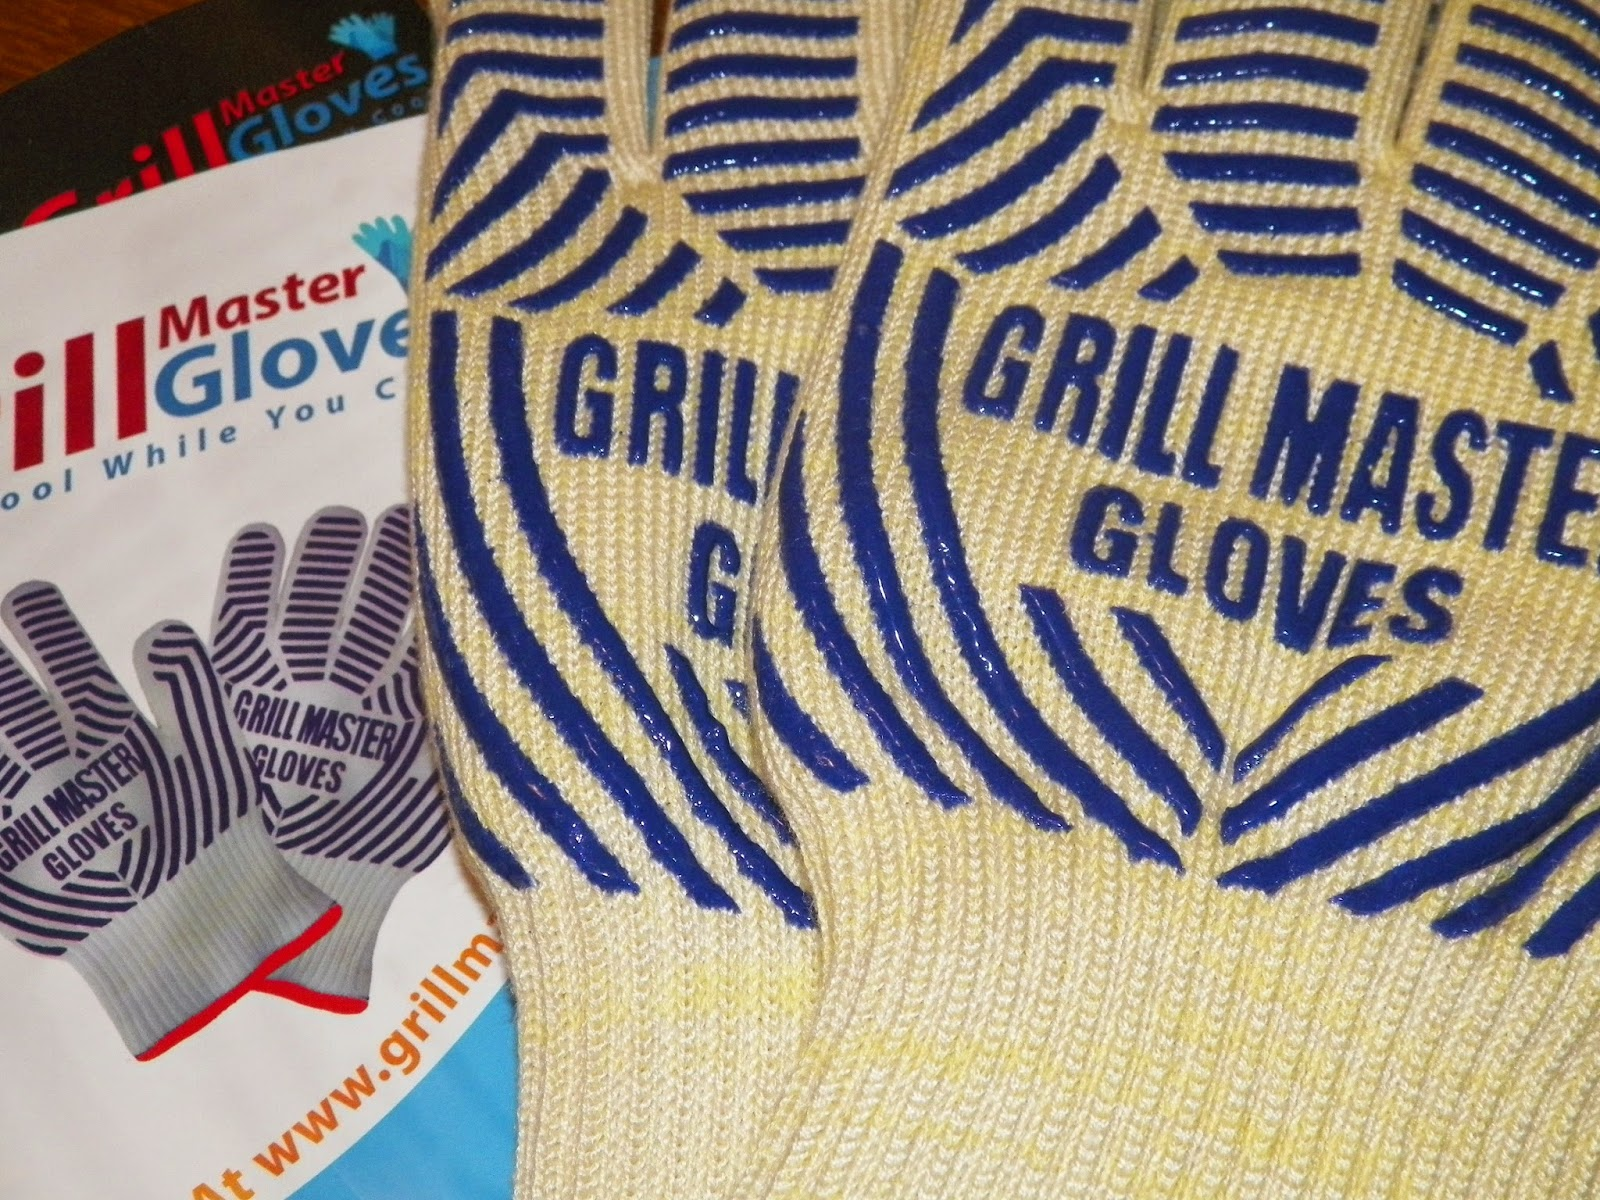 GrillMasterGloves.jpg